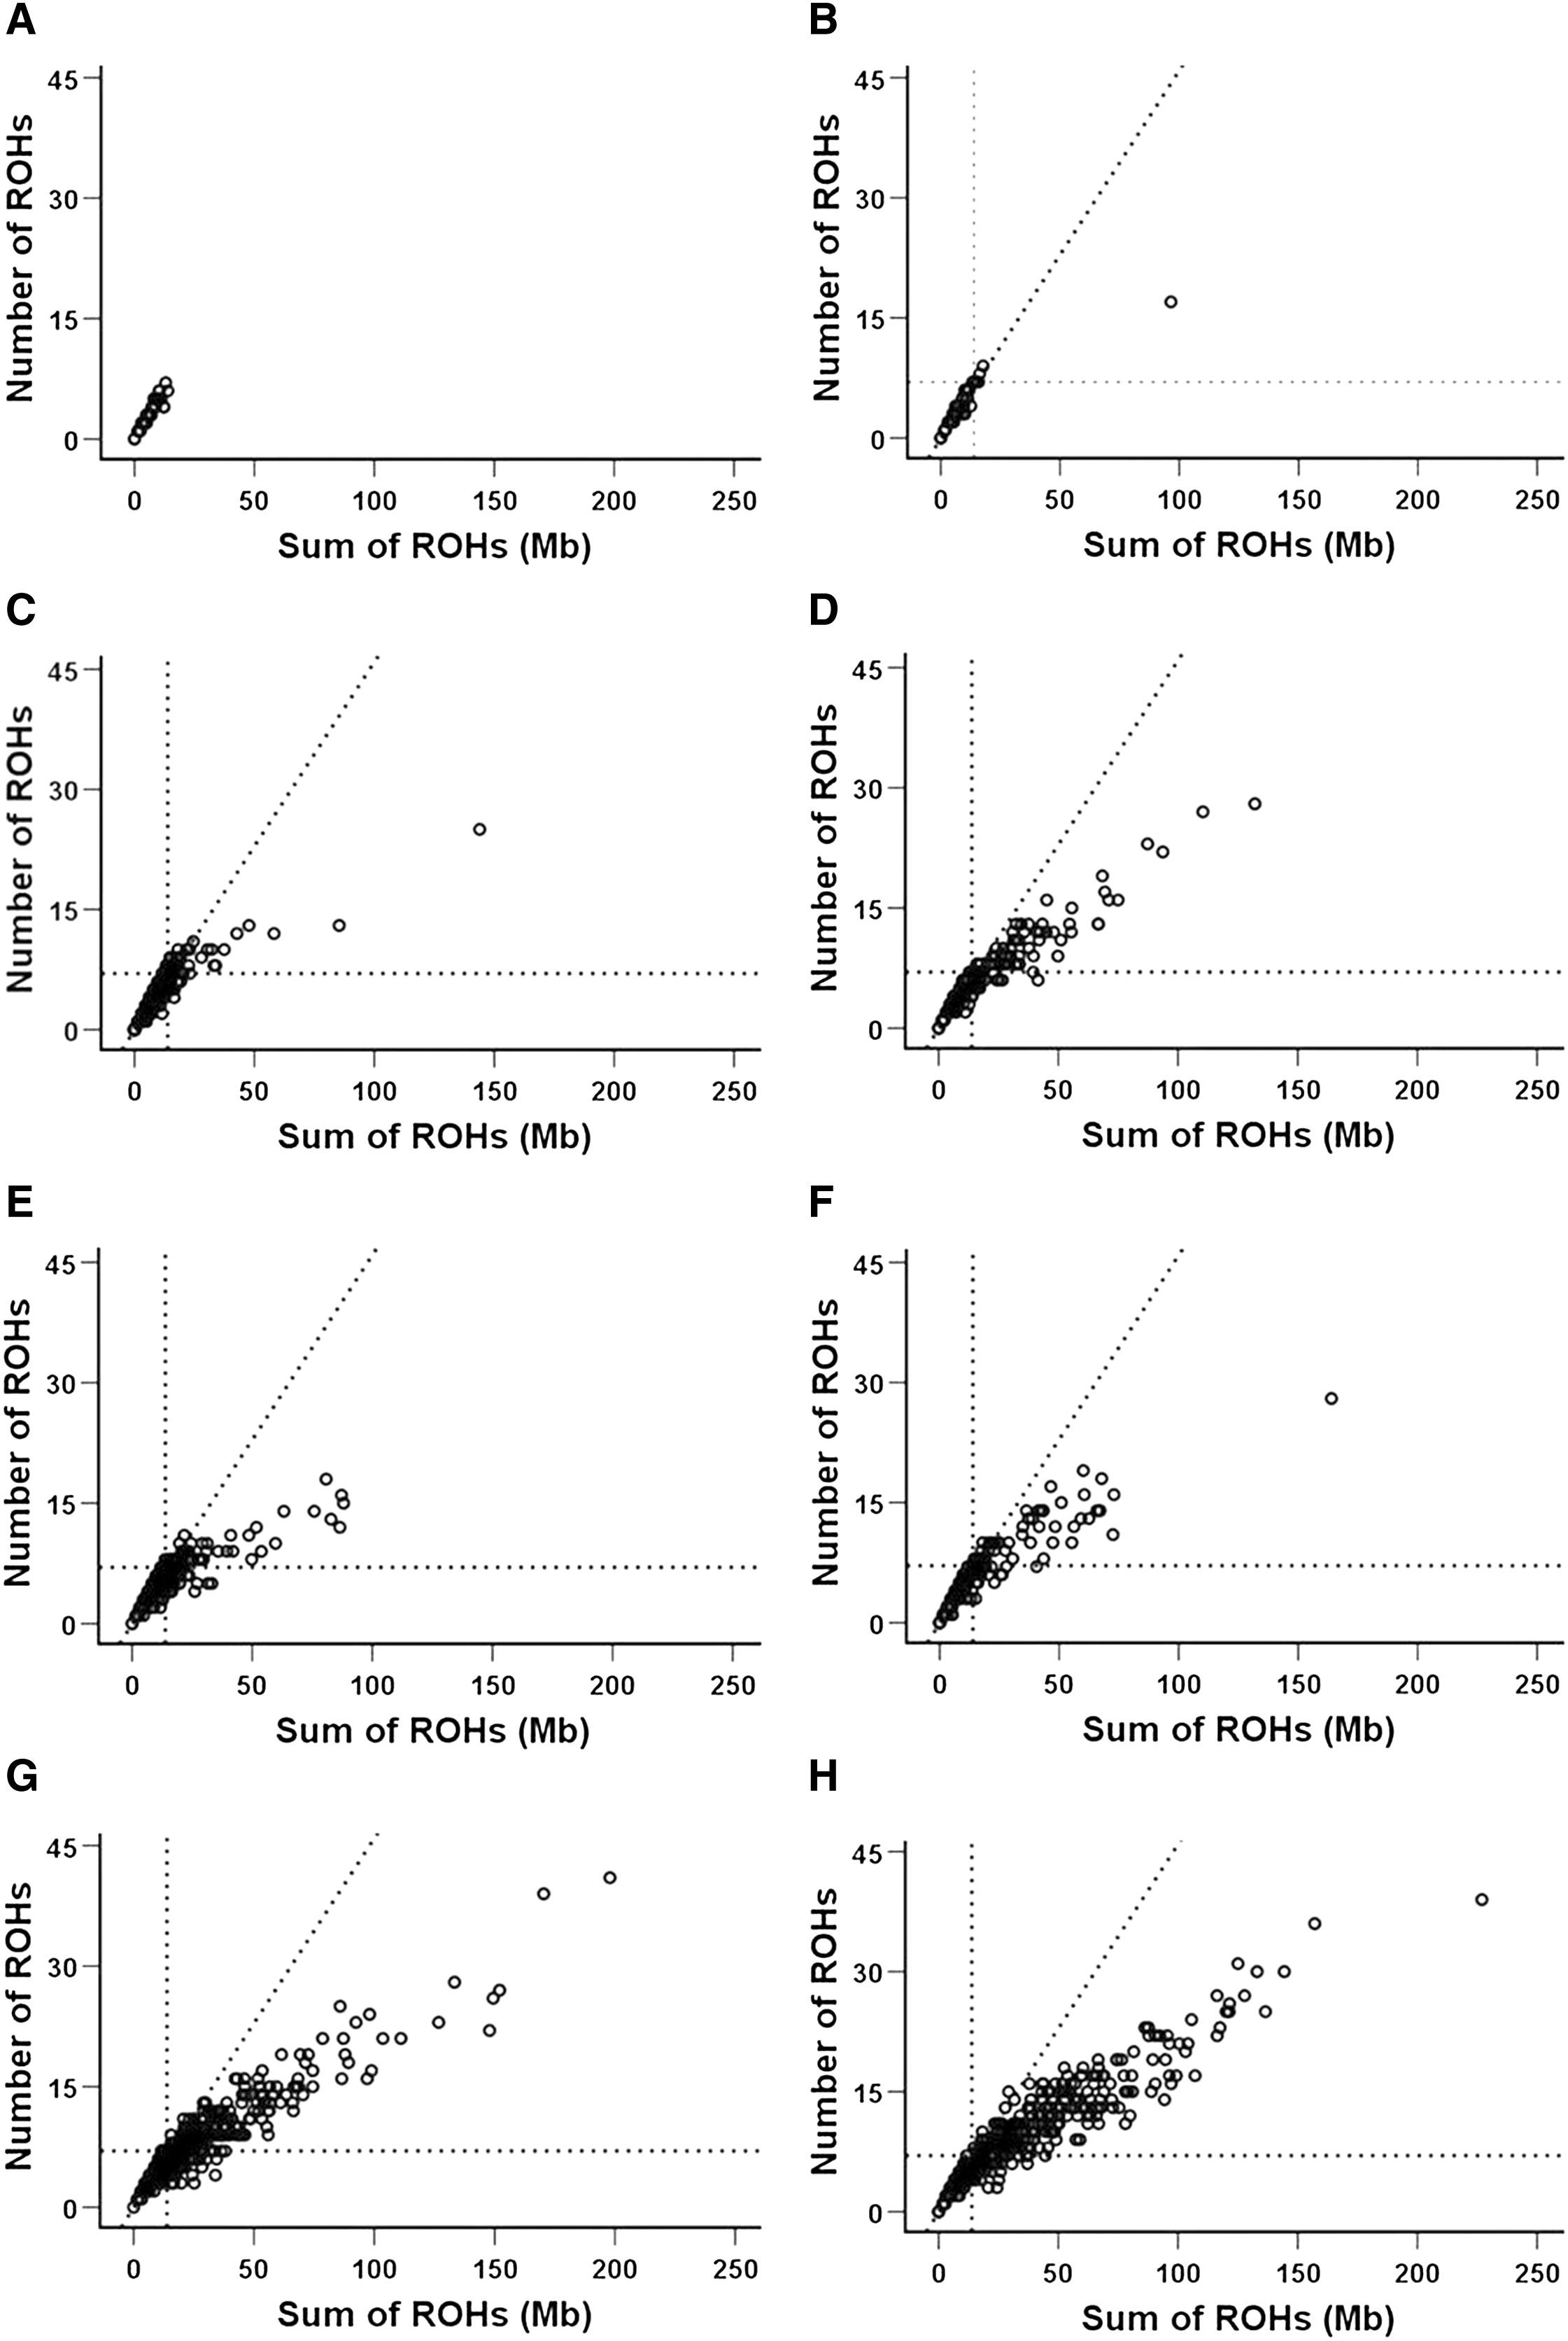 Runs of Homozygosity in European Populations: The American